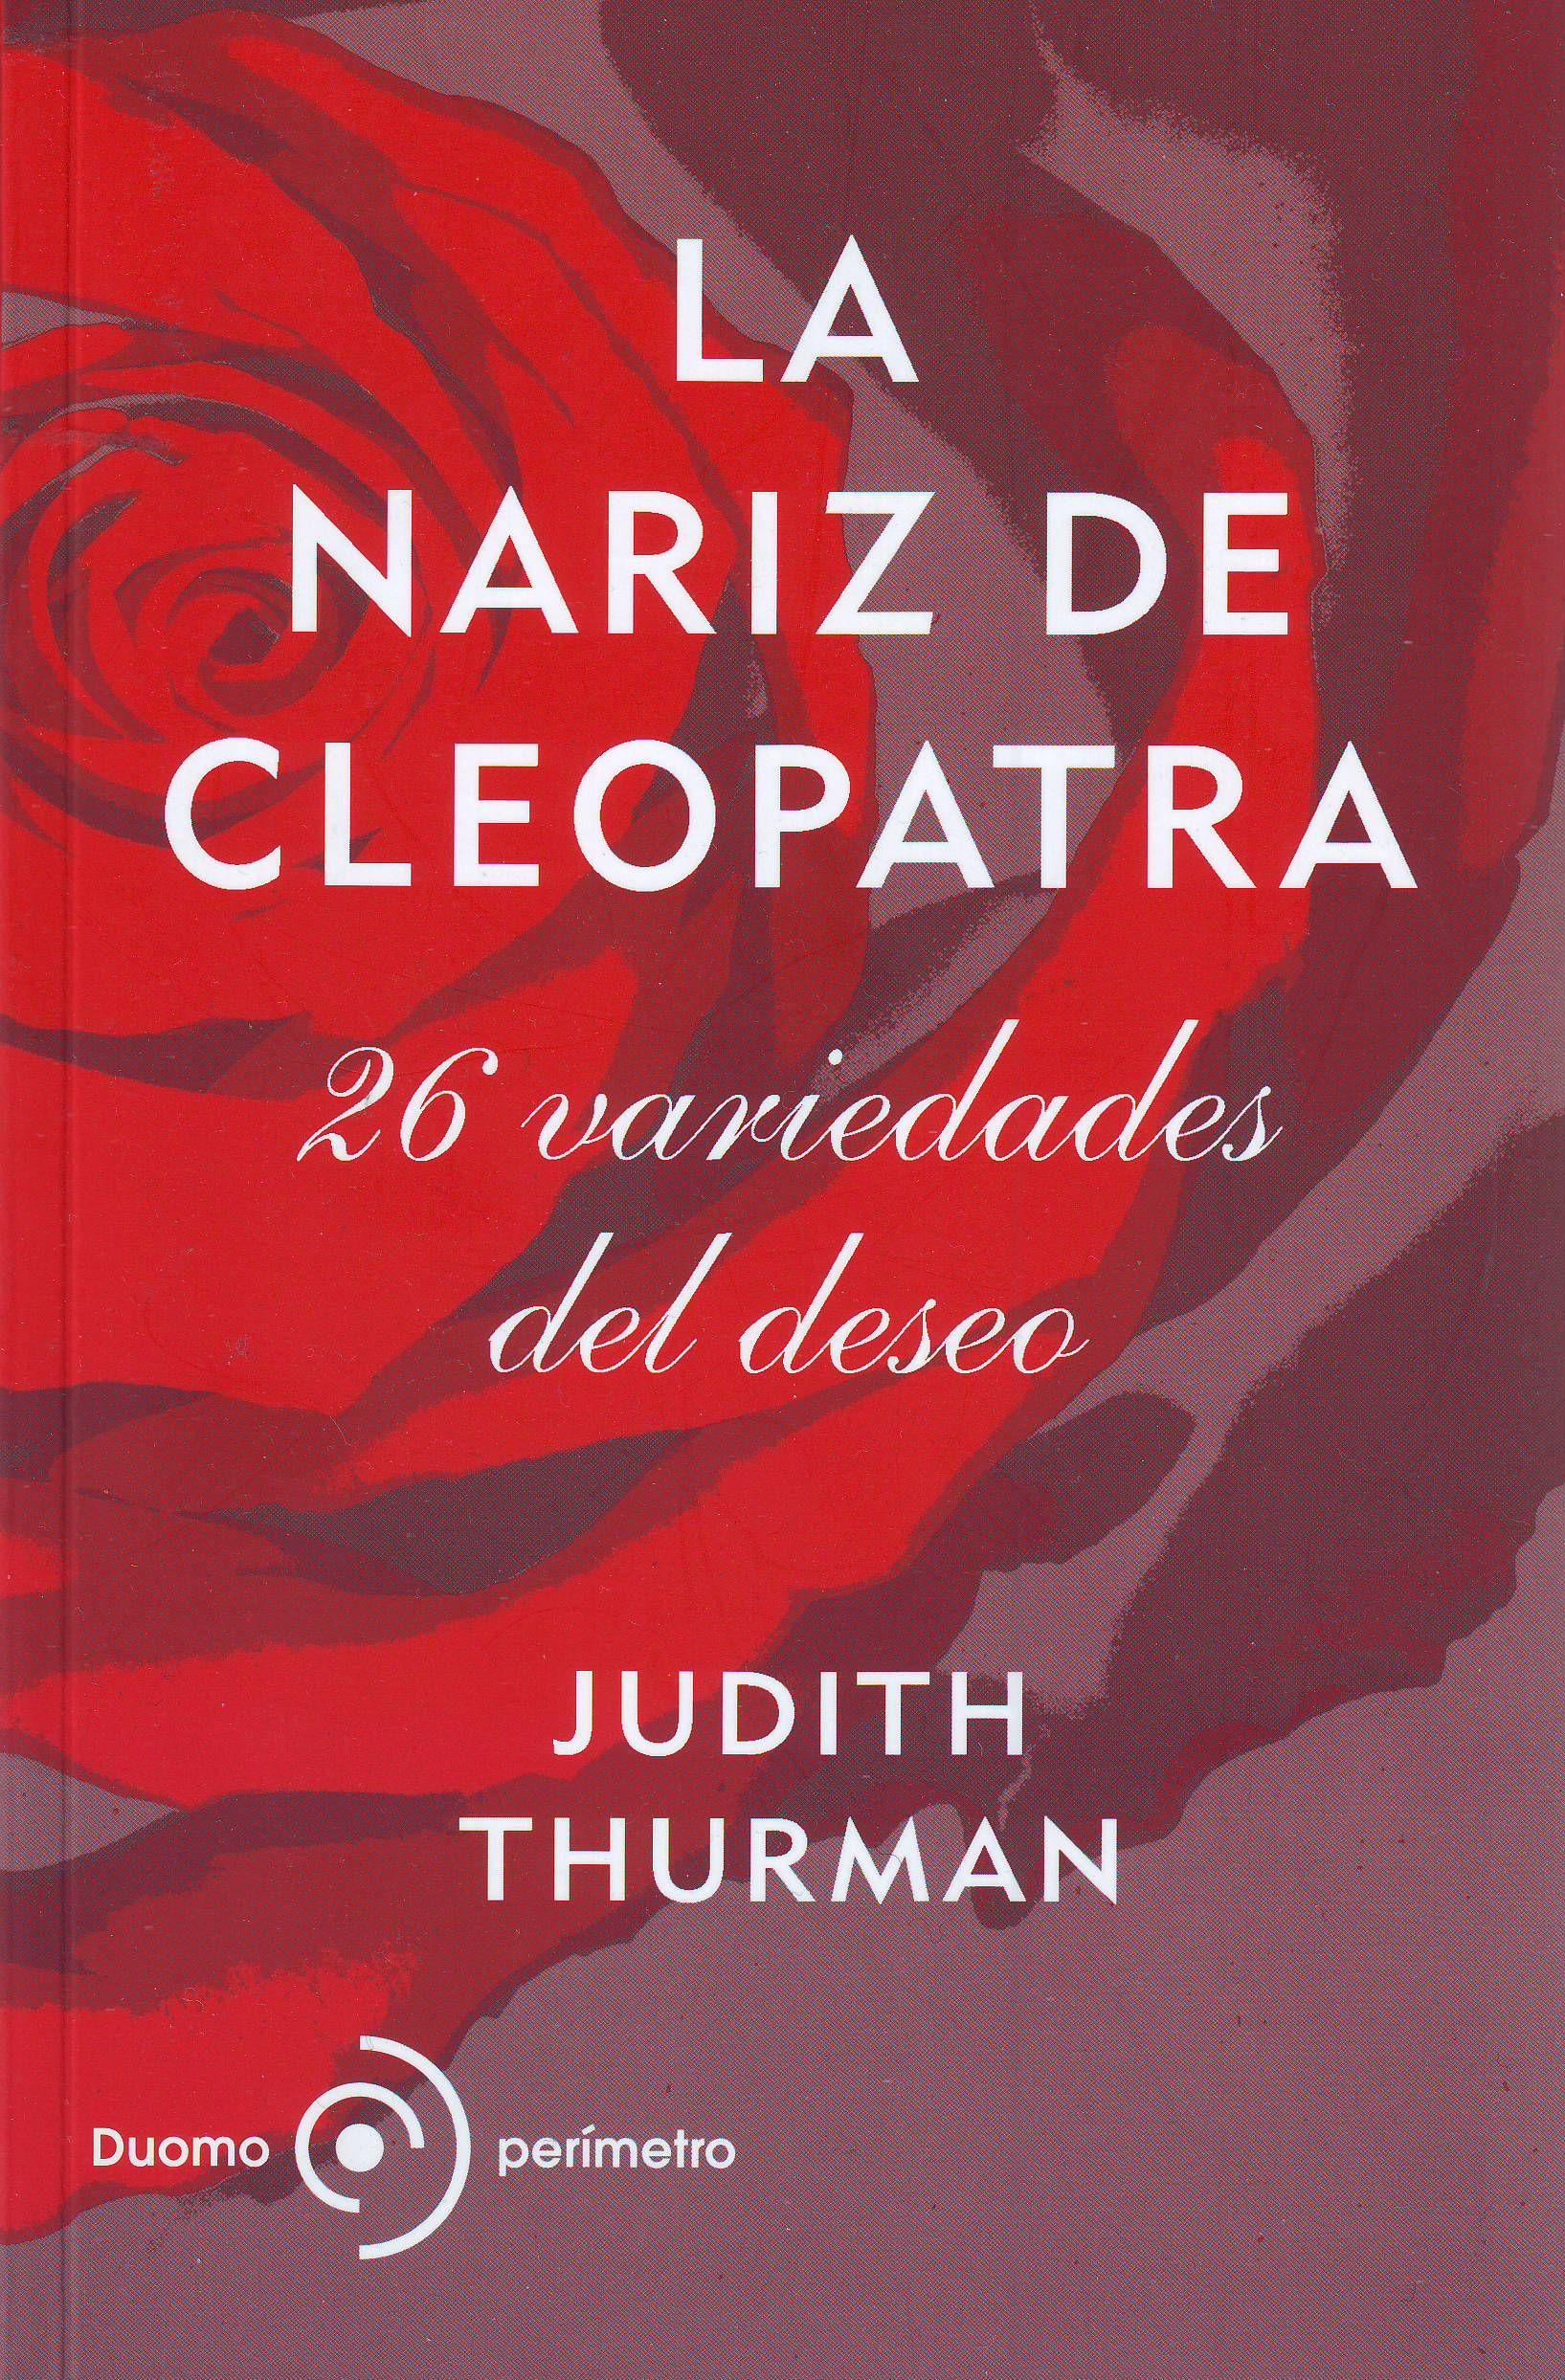 a Nariz de Cleopatra de Judith Thurman. Son 26 textos publicados en The New Yorker. Indispensable también!